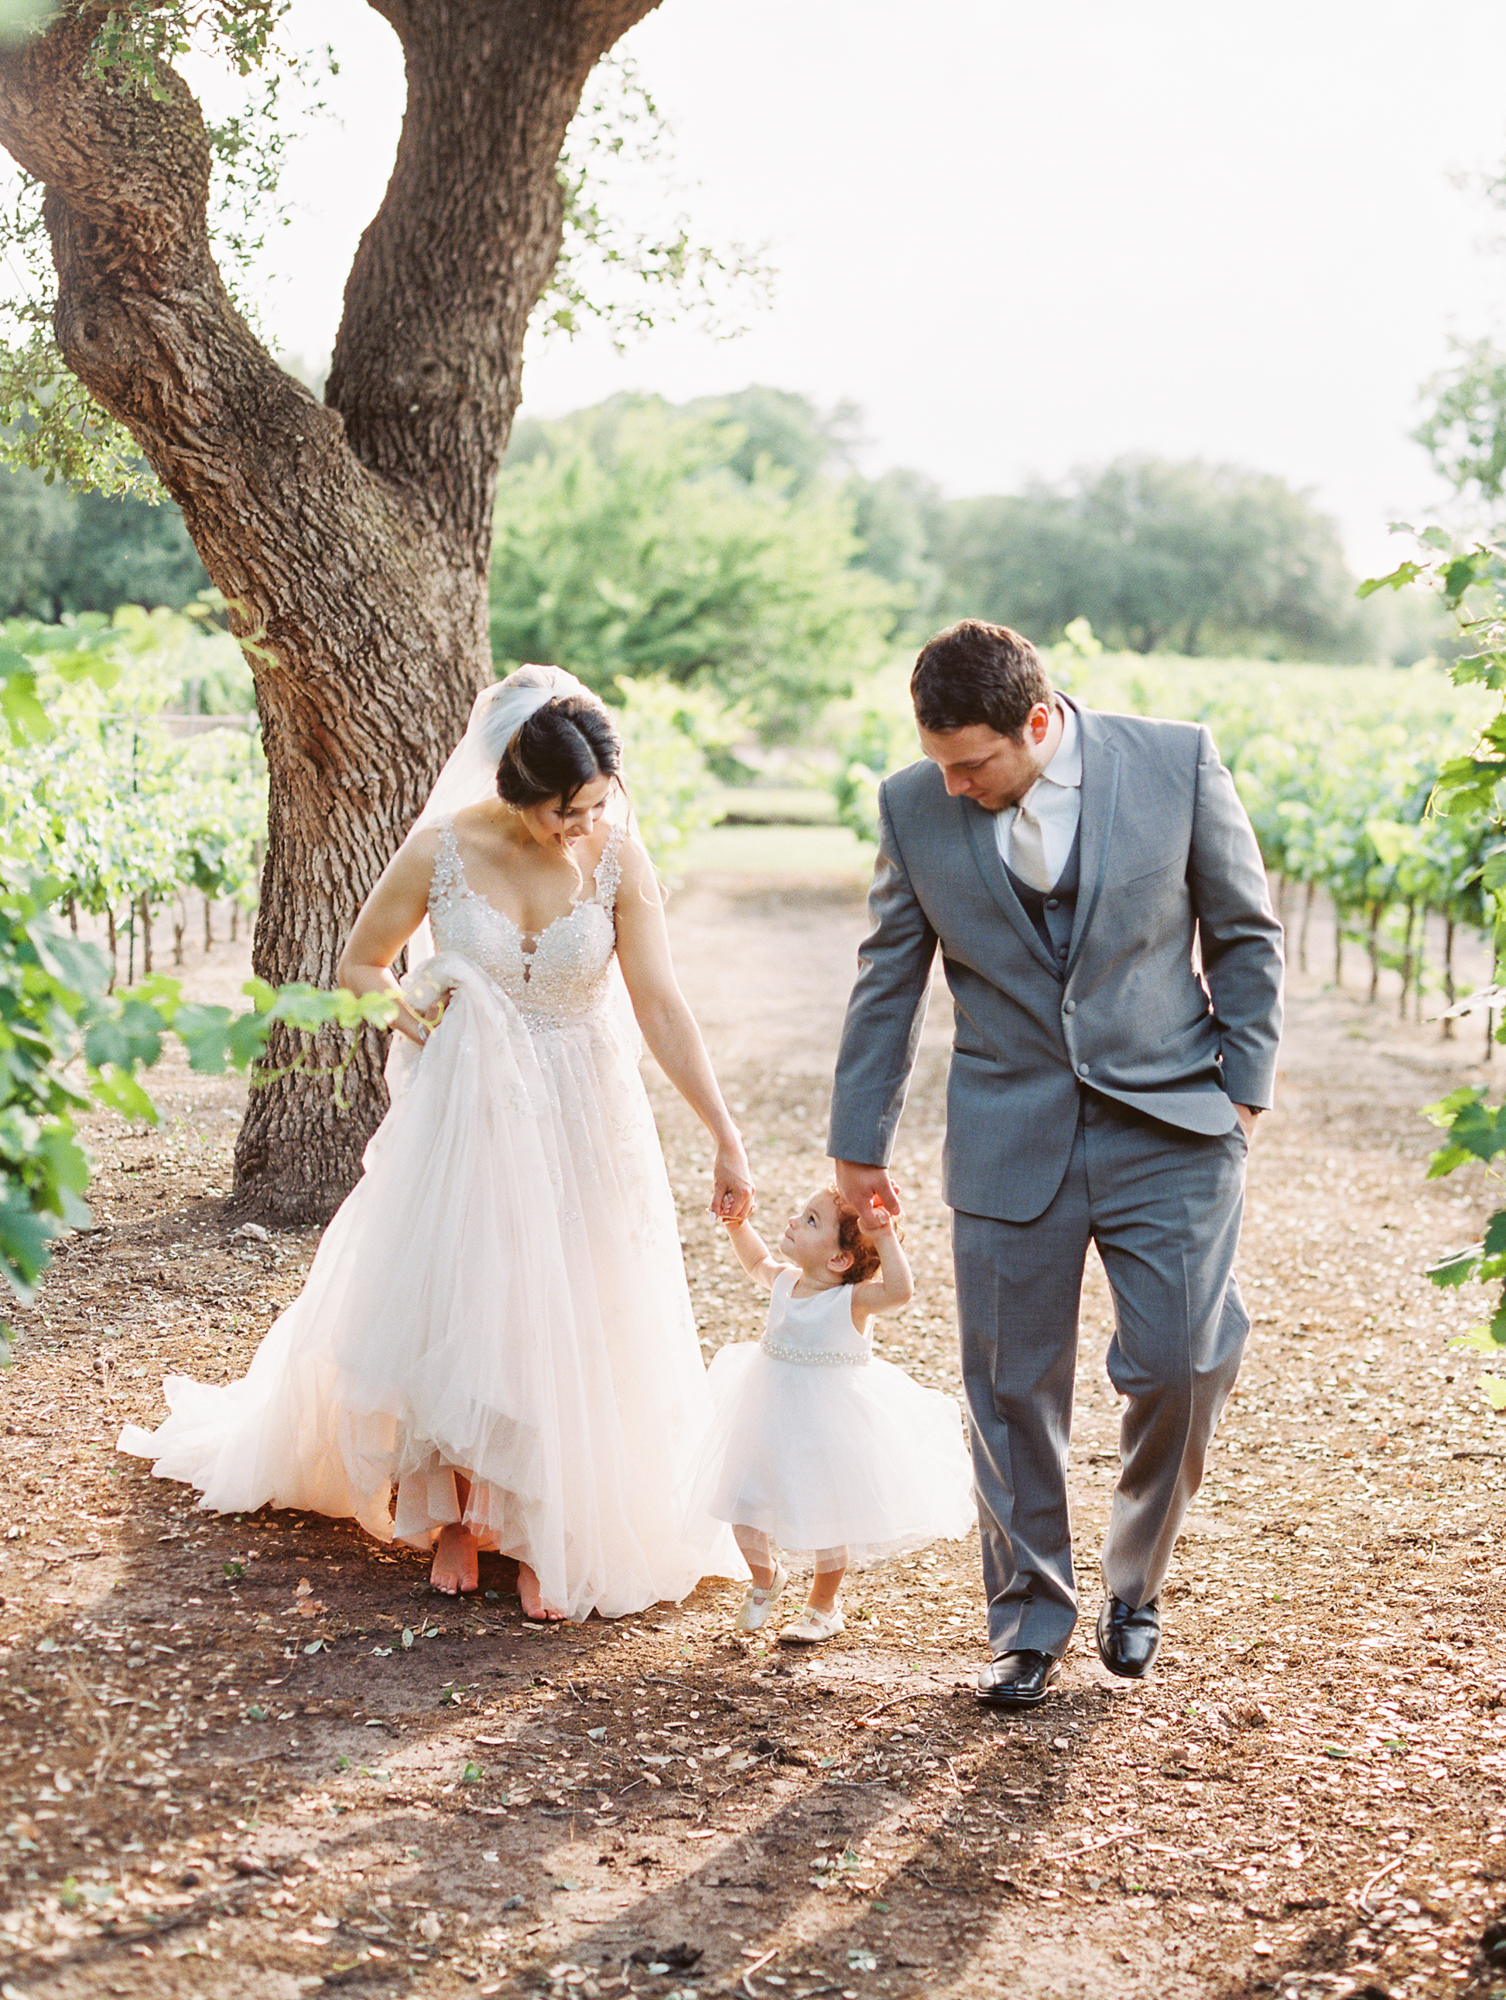 Elegant Spring Vineyard Wedding | Film Wedding Photographer | Austin Wedding Photographer | Bride and Groom Romantic Photos | Britni Dean Photography // britnidean.com